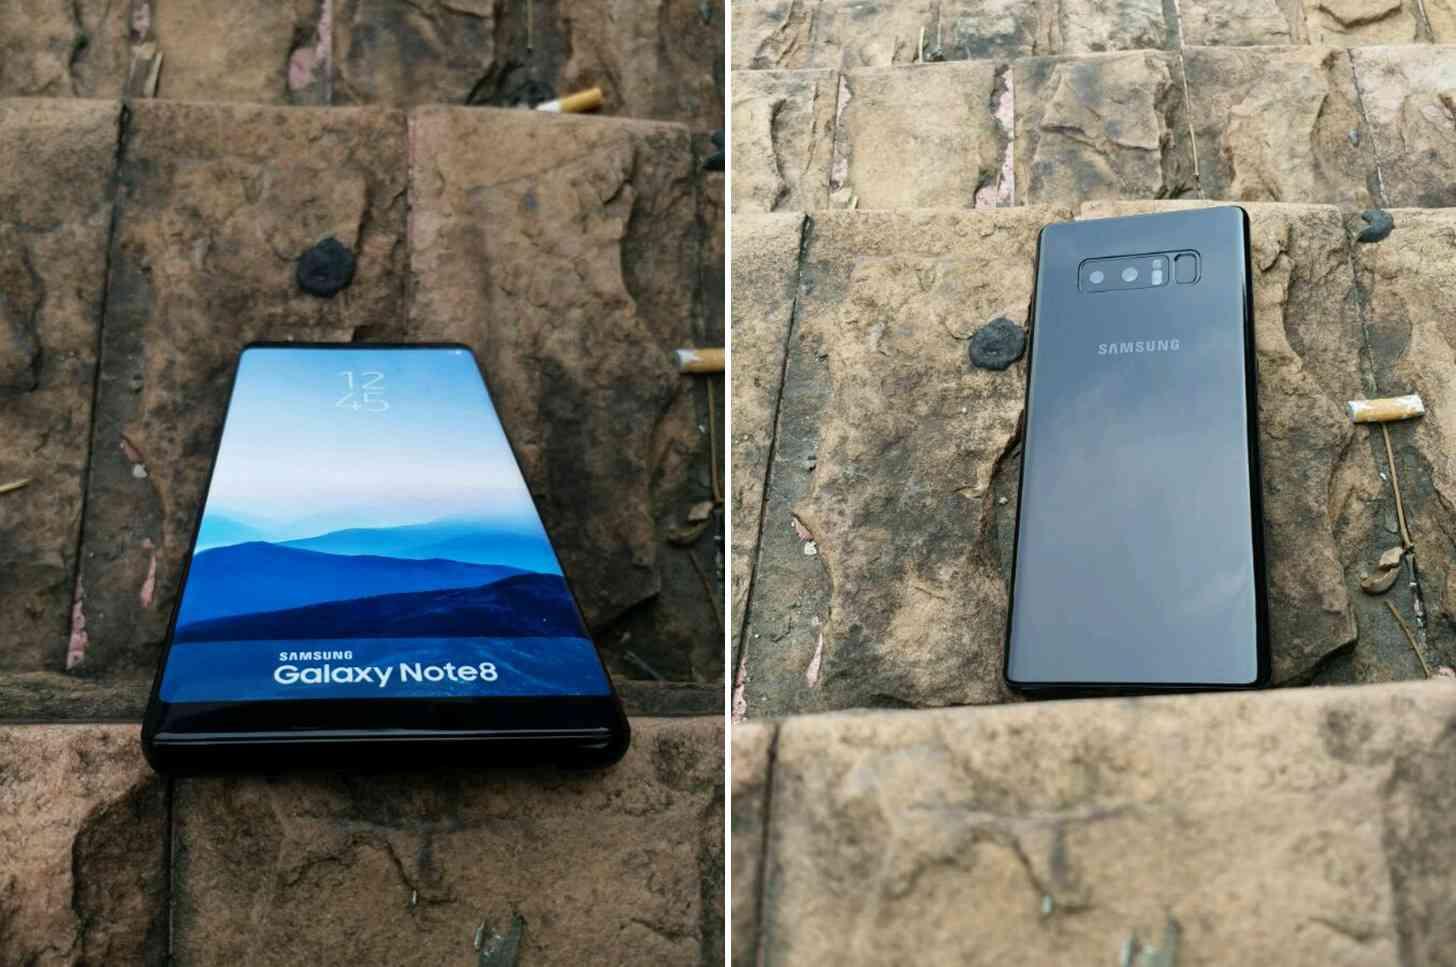 Samsung Galaxy Note 8 photos leak